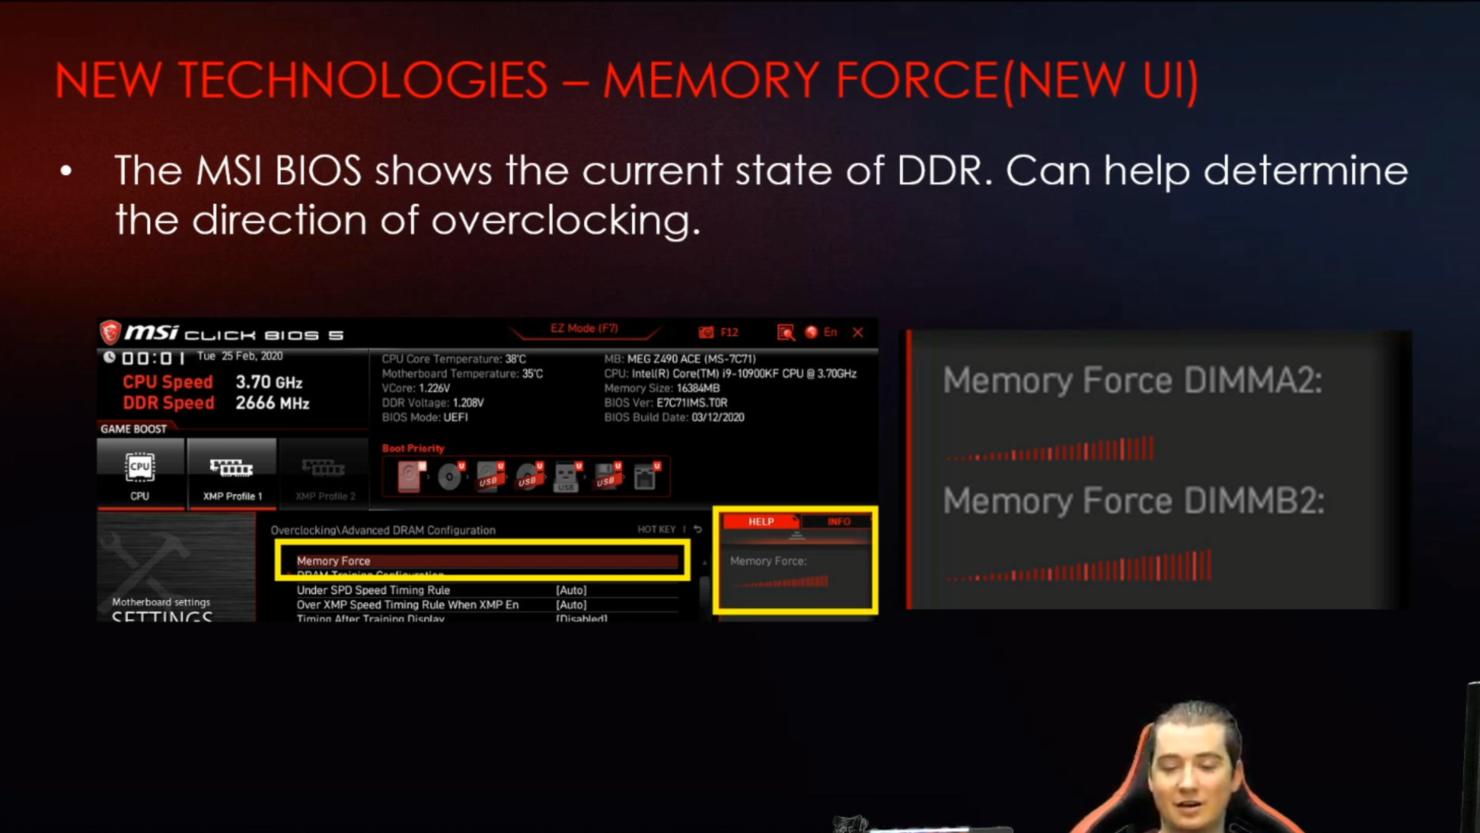 msi-b560-h510-motherboards-intel-10th-gen-11th-gen-desktop-cpus-_-prices-specs-_-memory-overclock-_4